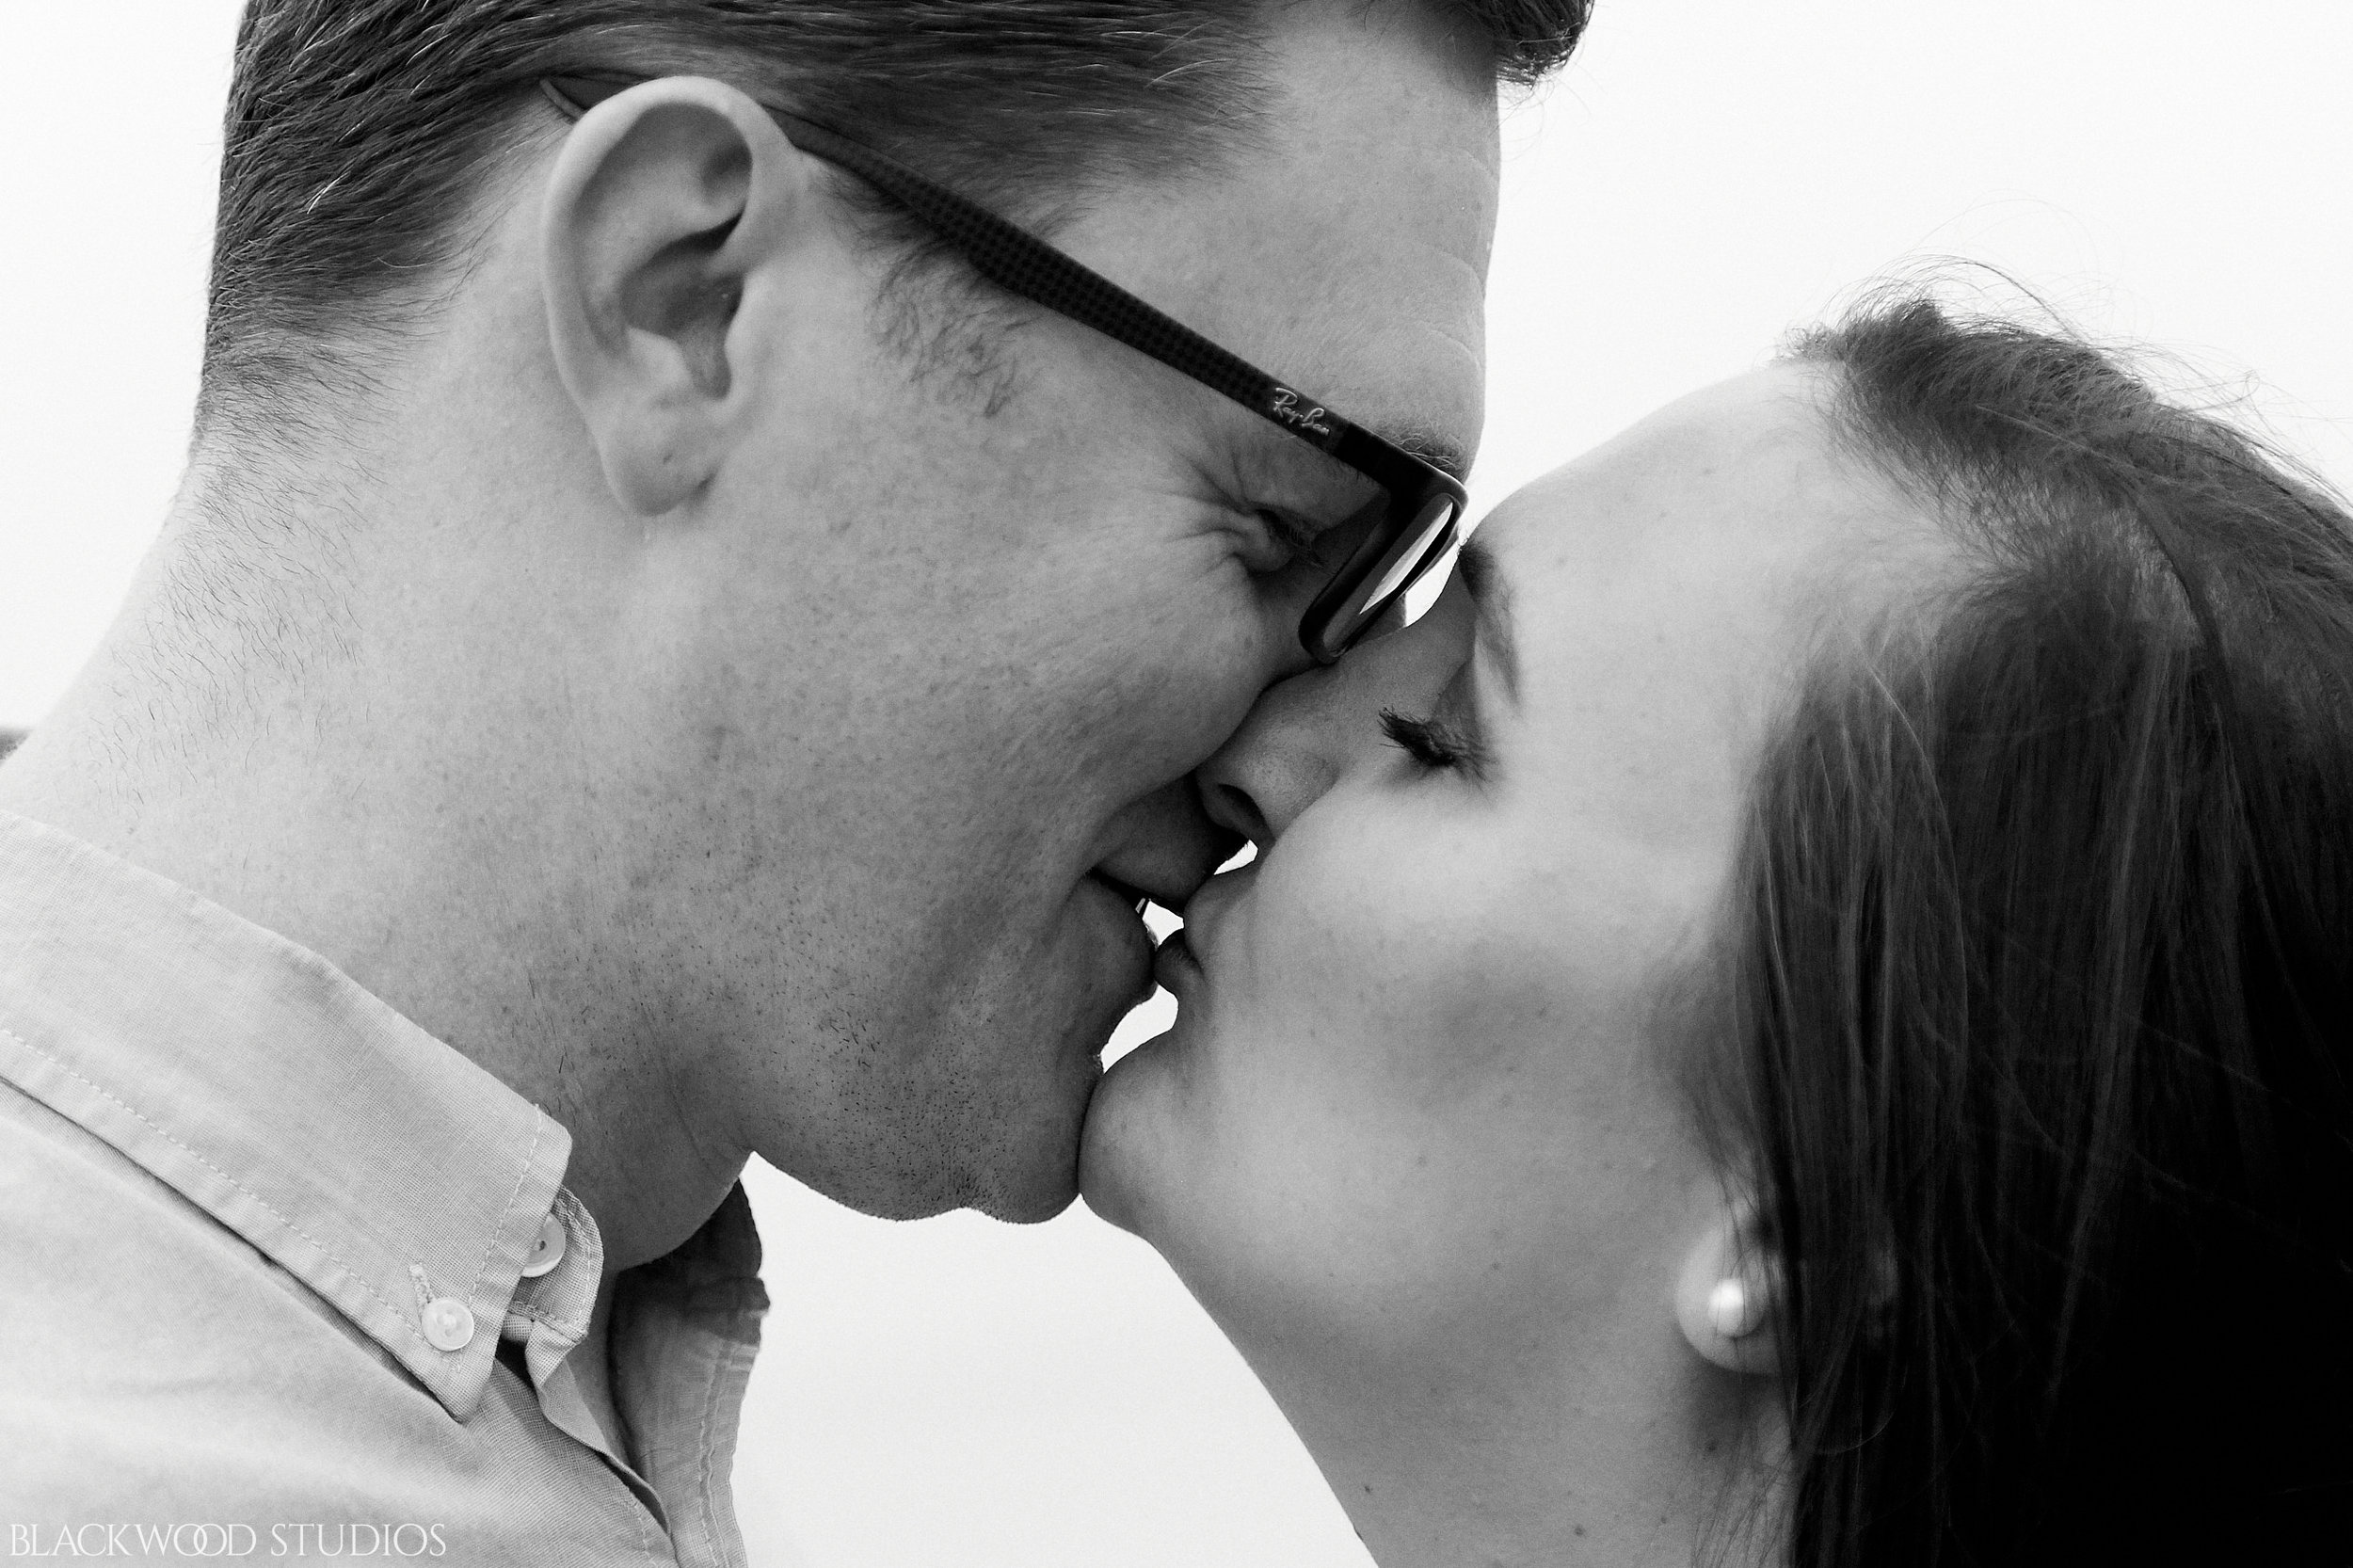 Blackwood-Studios-20181008-17-36-24-Justin-and-Samantha-Engagement-Photography-foggy-Scaraborough-Bluffs-Park-Ontario.jpg